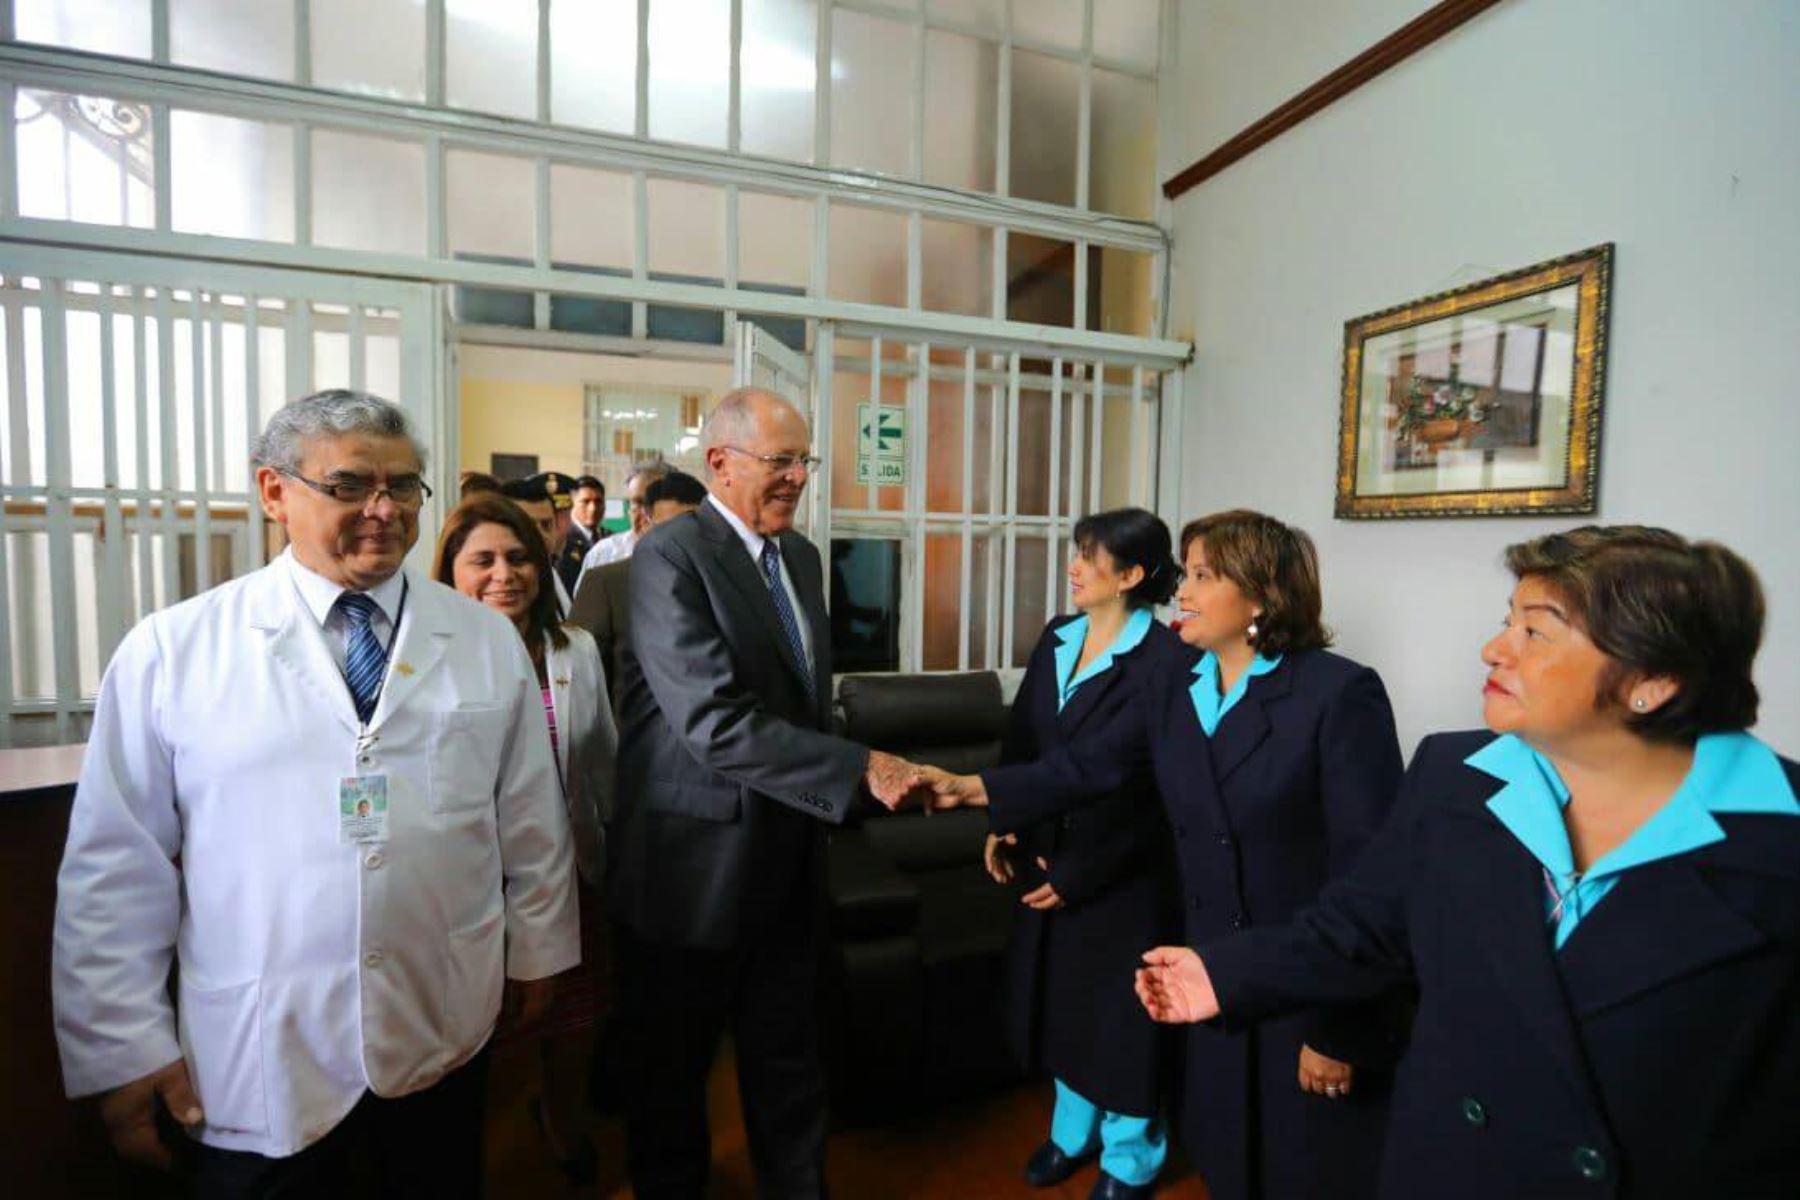 El presidente de la República, Pedro Pablo Kuczynski, visita el hospital Arzobispo Loayza. Foto: ANDINA/ Prensa Presidencia